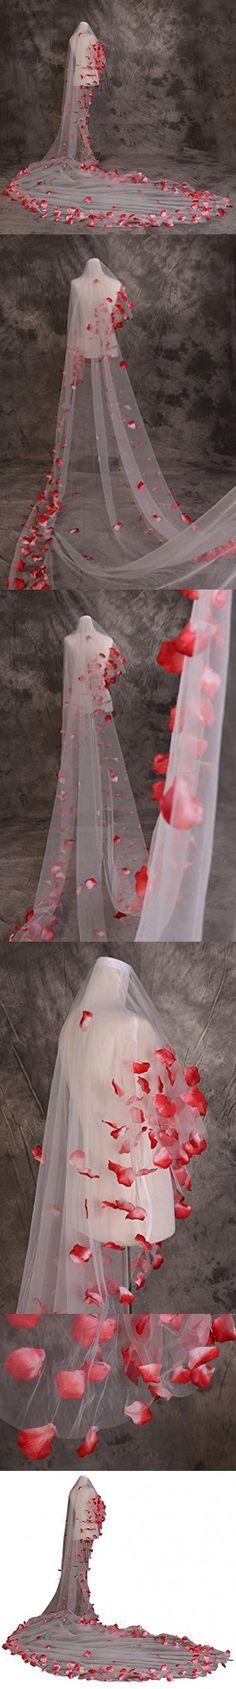 Drasawee 1T Cathedral Length Red Flower Petal Long Wedding Bridal Veil 500CM/196Inch